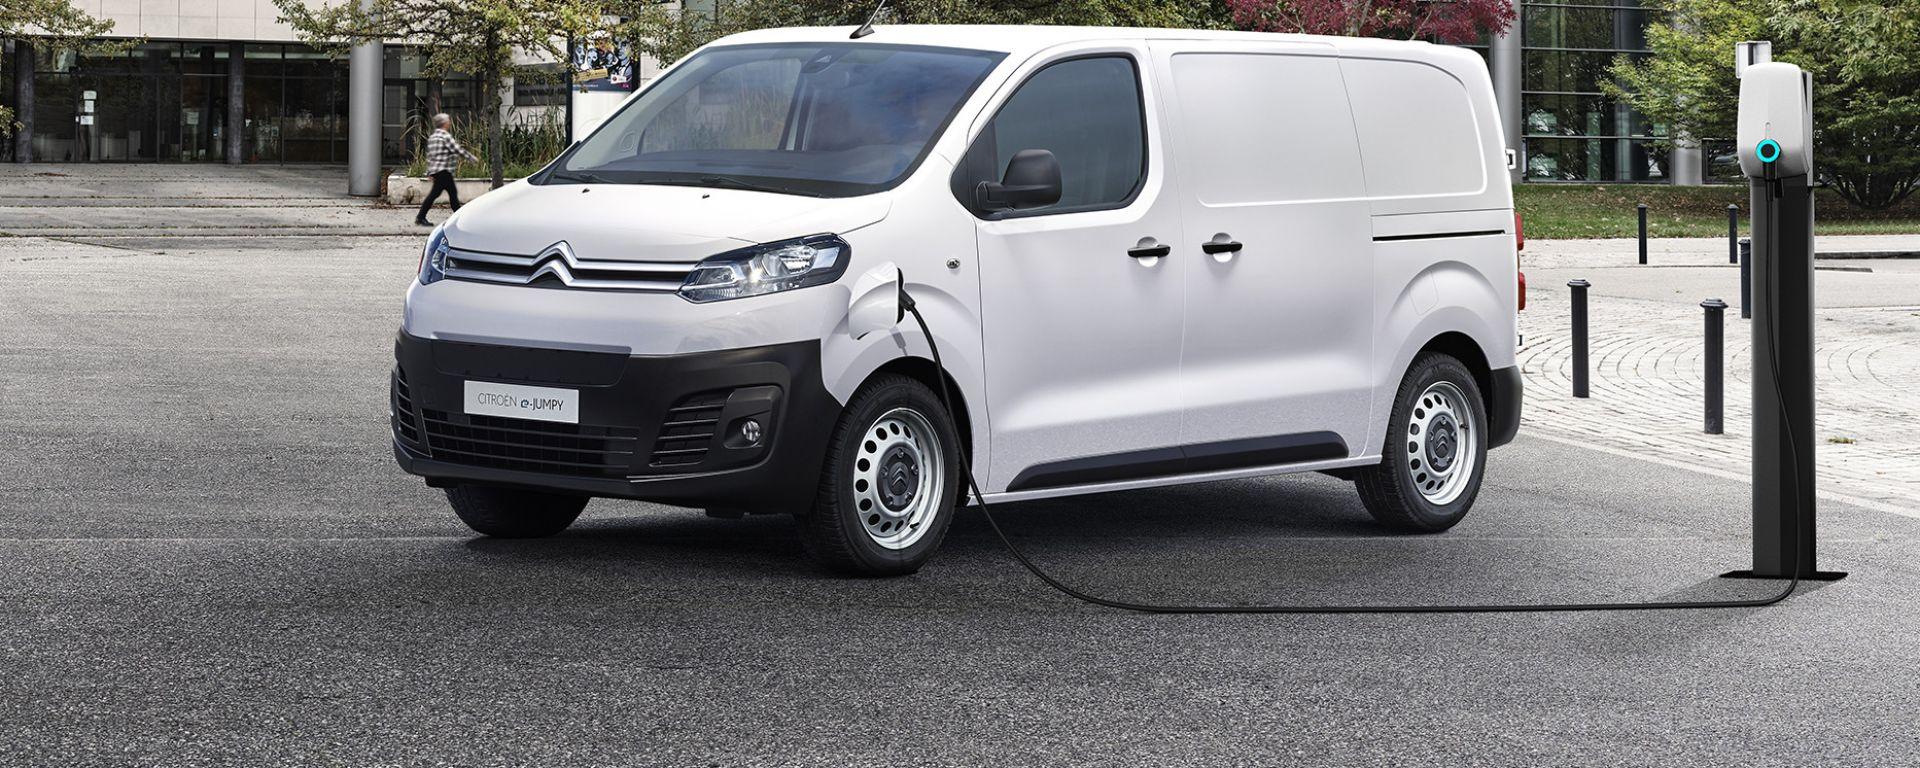 Citroen e-Jumpy XS 50 kWh